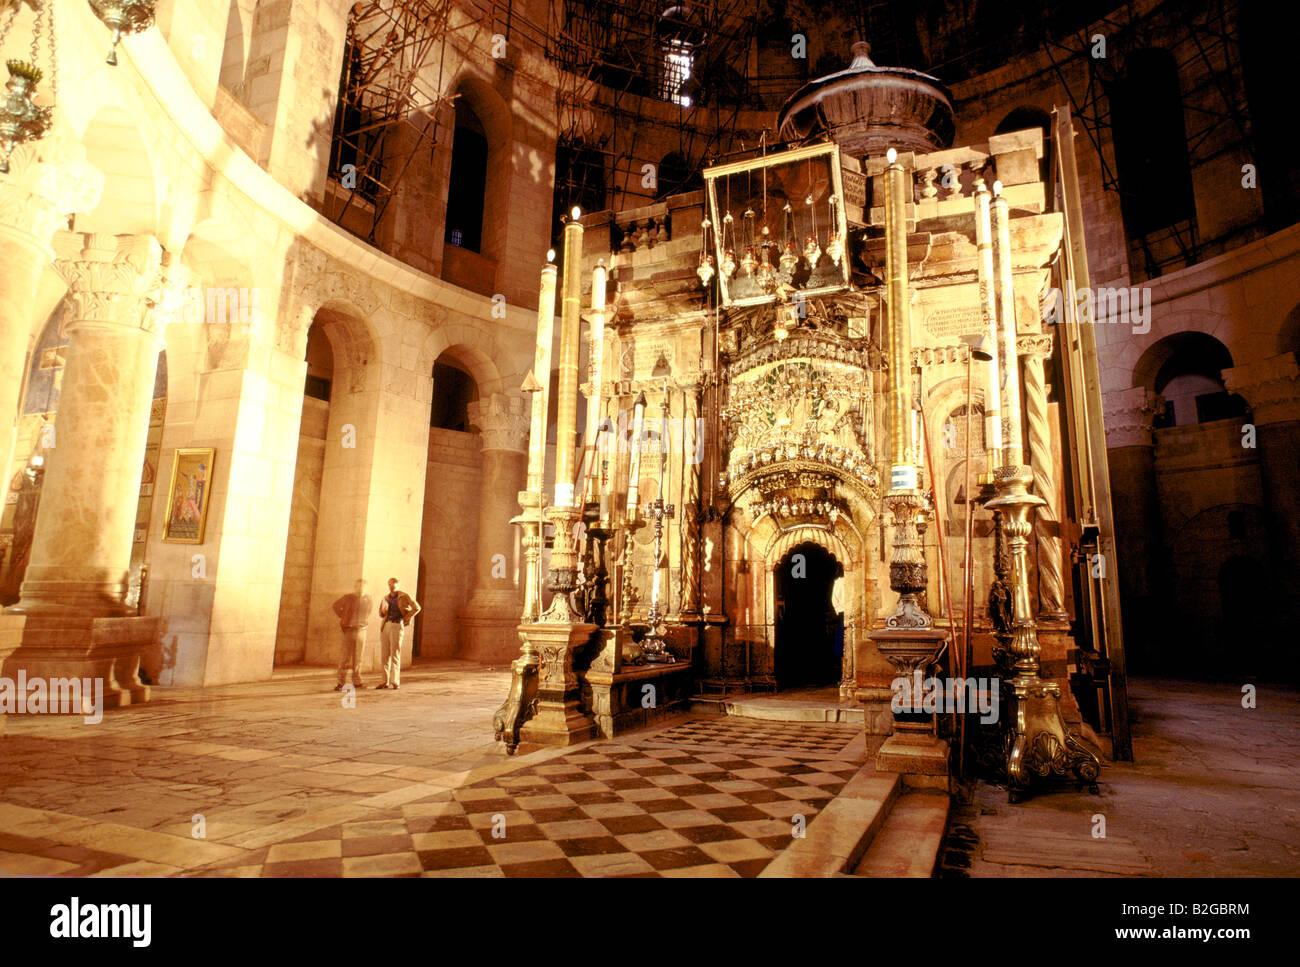 edicule inside the church of holy sepulchre jerusalem - Stock Image